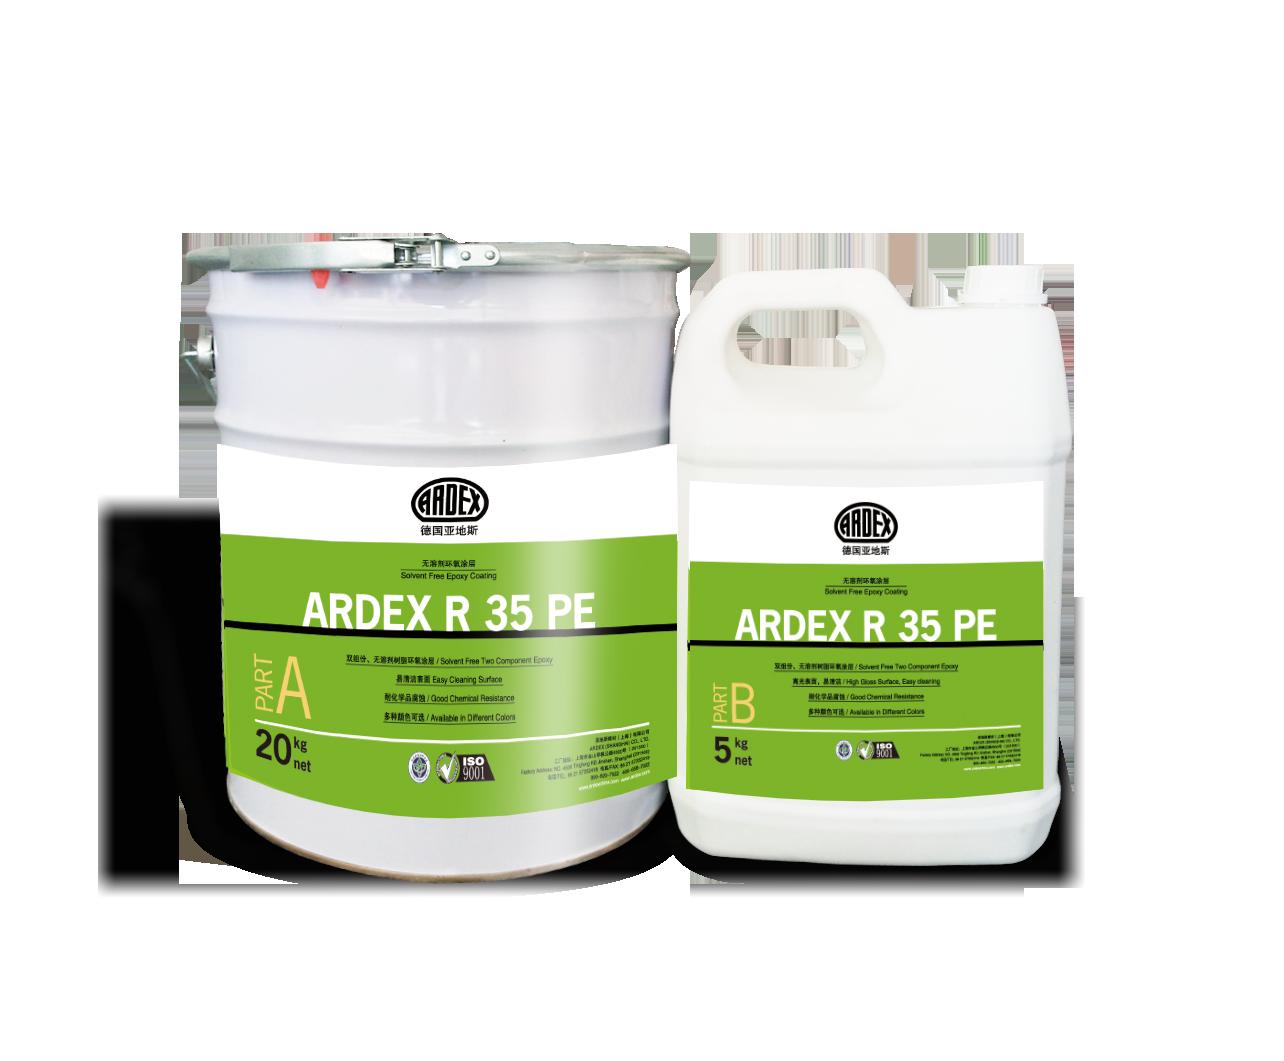 ARDEX R 35 PE